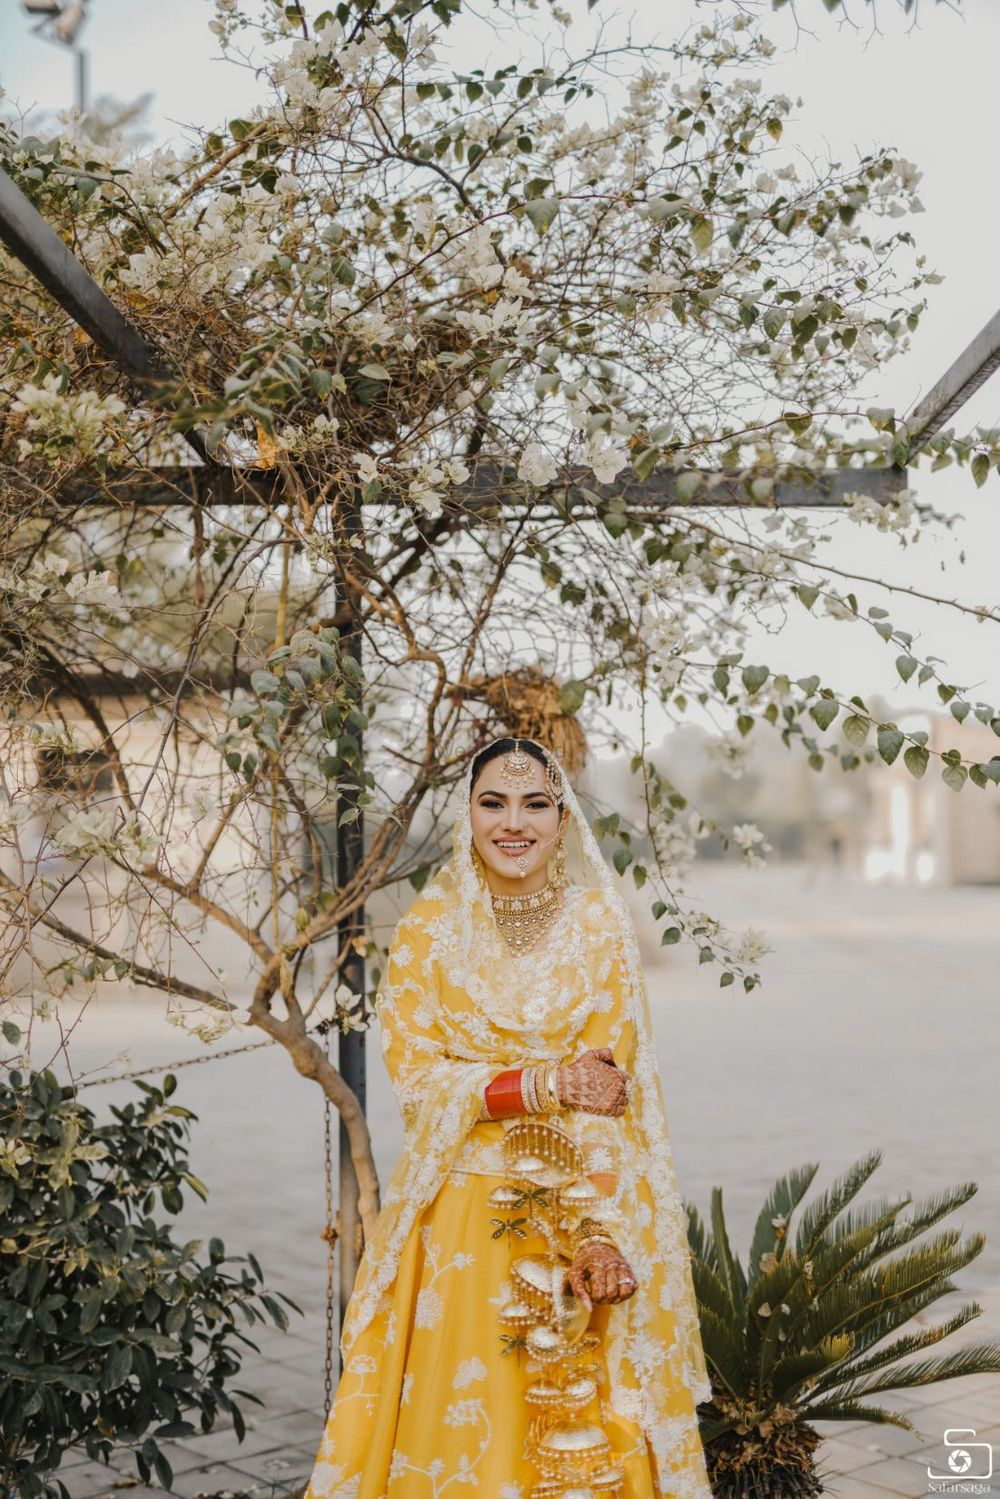 Photo From Gurlab and manpreet - Best Wedding Highlight - Safarsaga Films - By Safarsaga Films